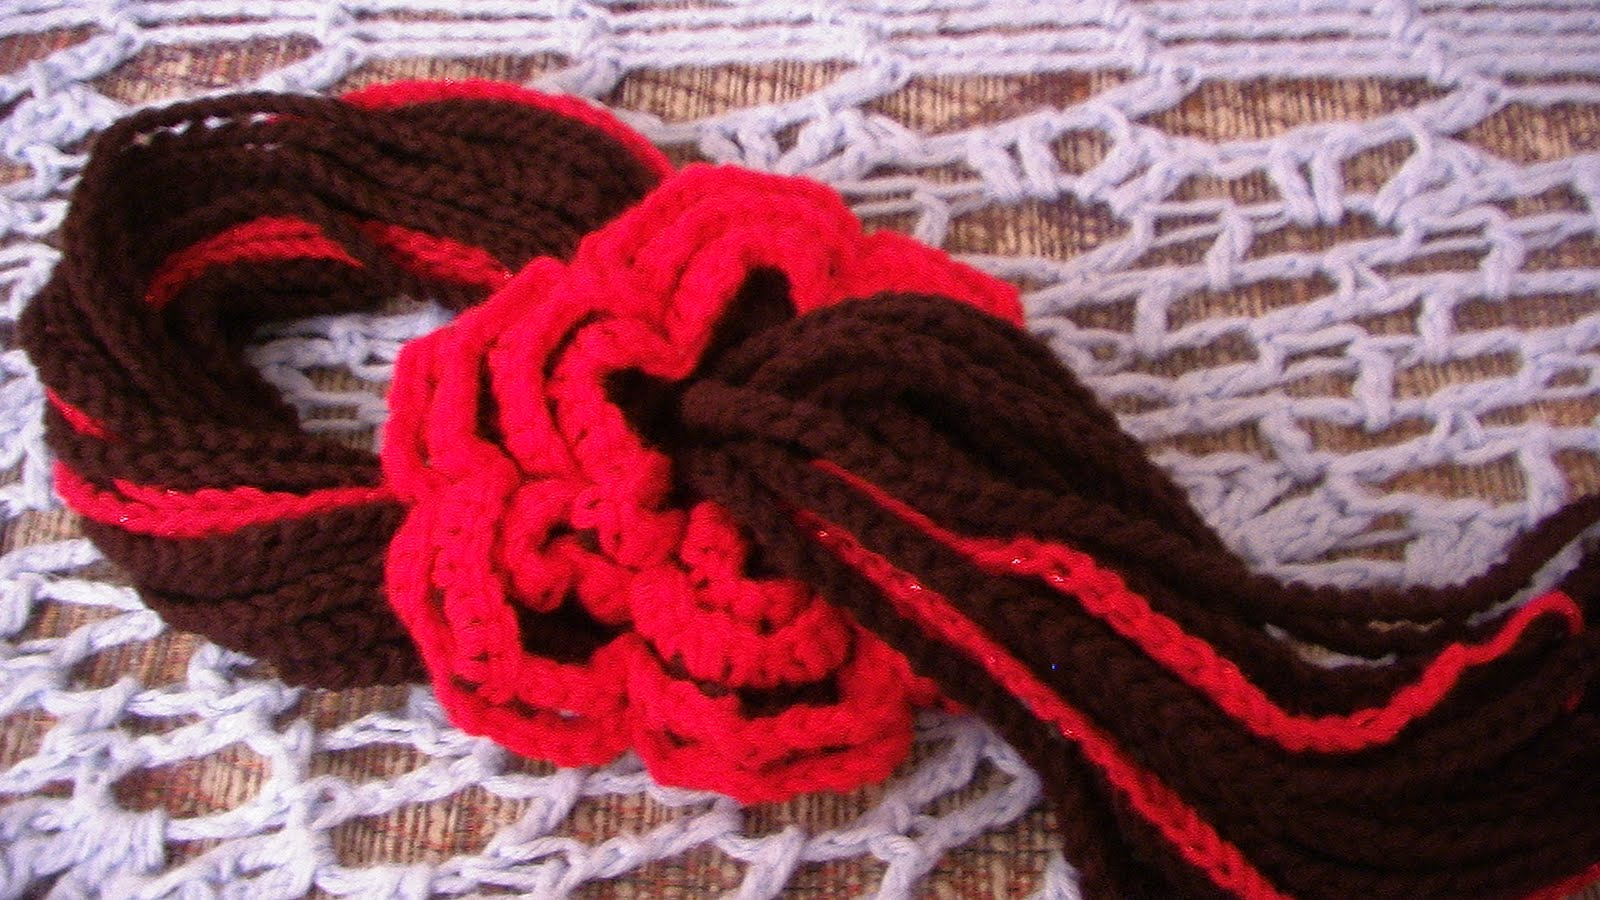 http://4.bp.blogspot.com/-afWVAxfEY3k/TlWbMA1hN_I/AAAAAAAABms/P3RP_kZ36JE/s1600/red+and+black+scarf.JPG